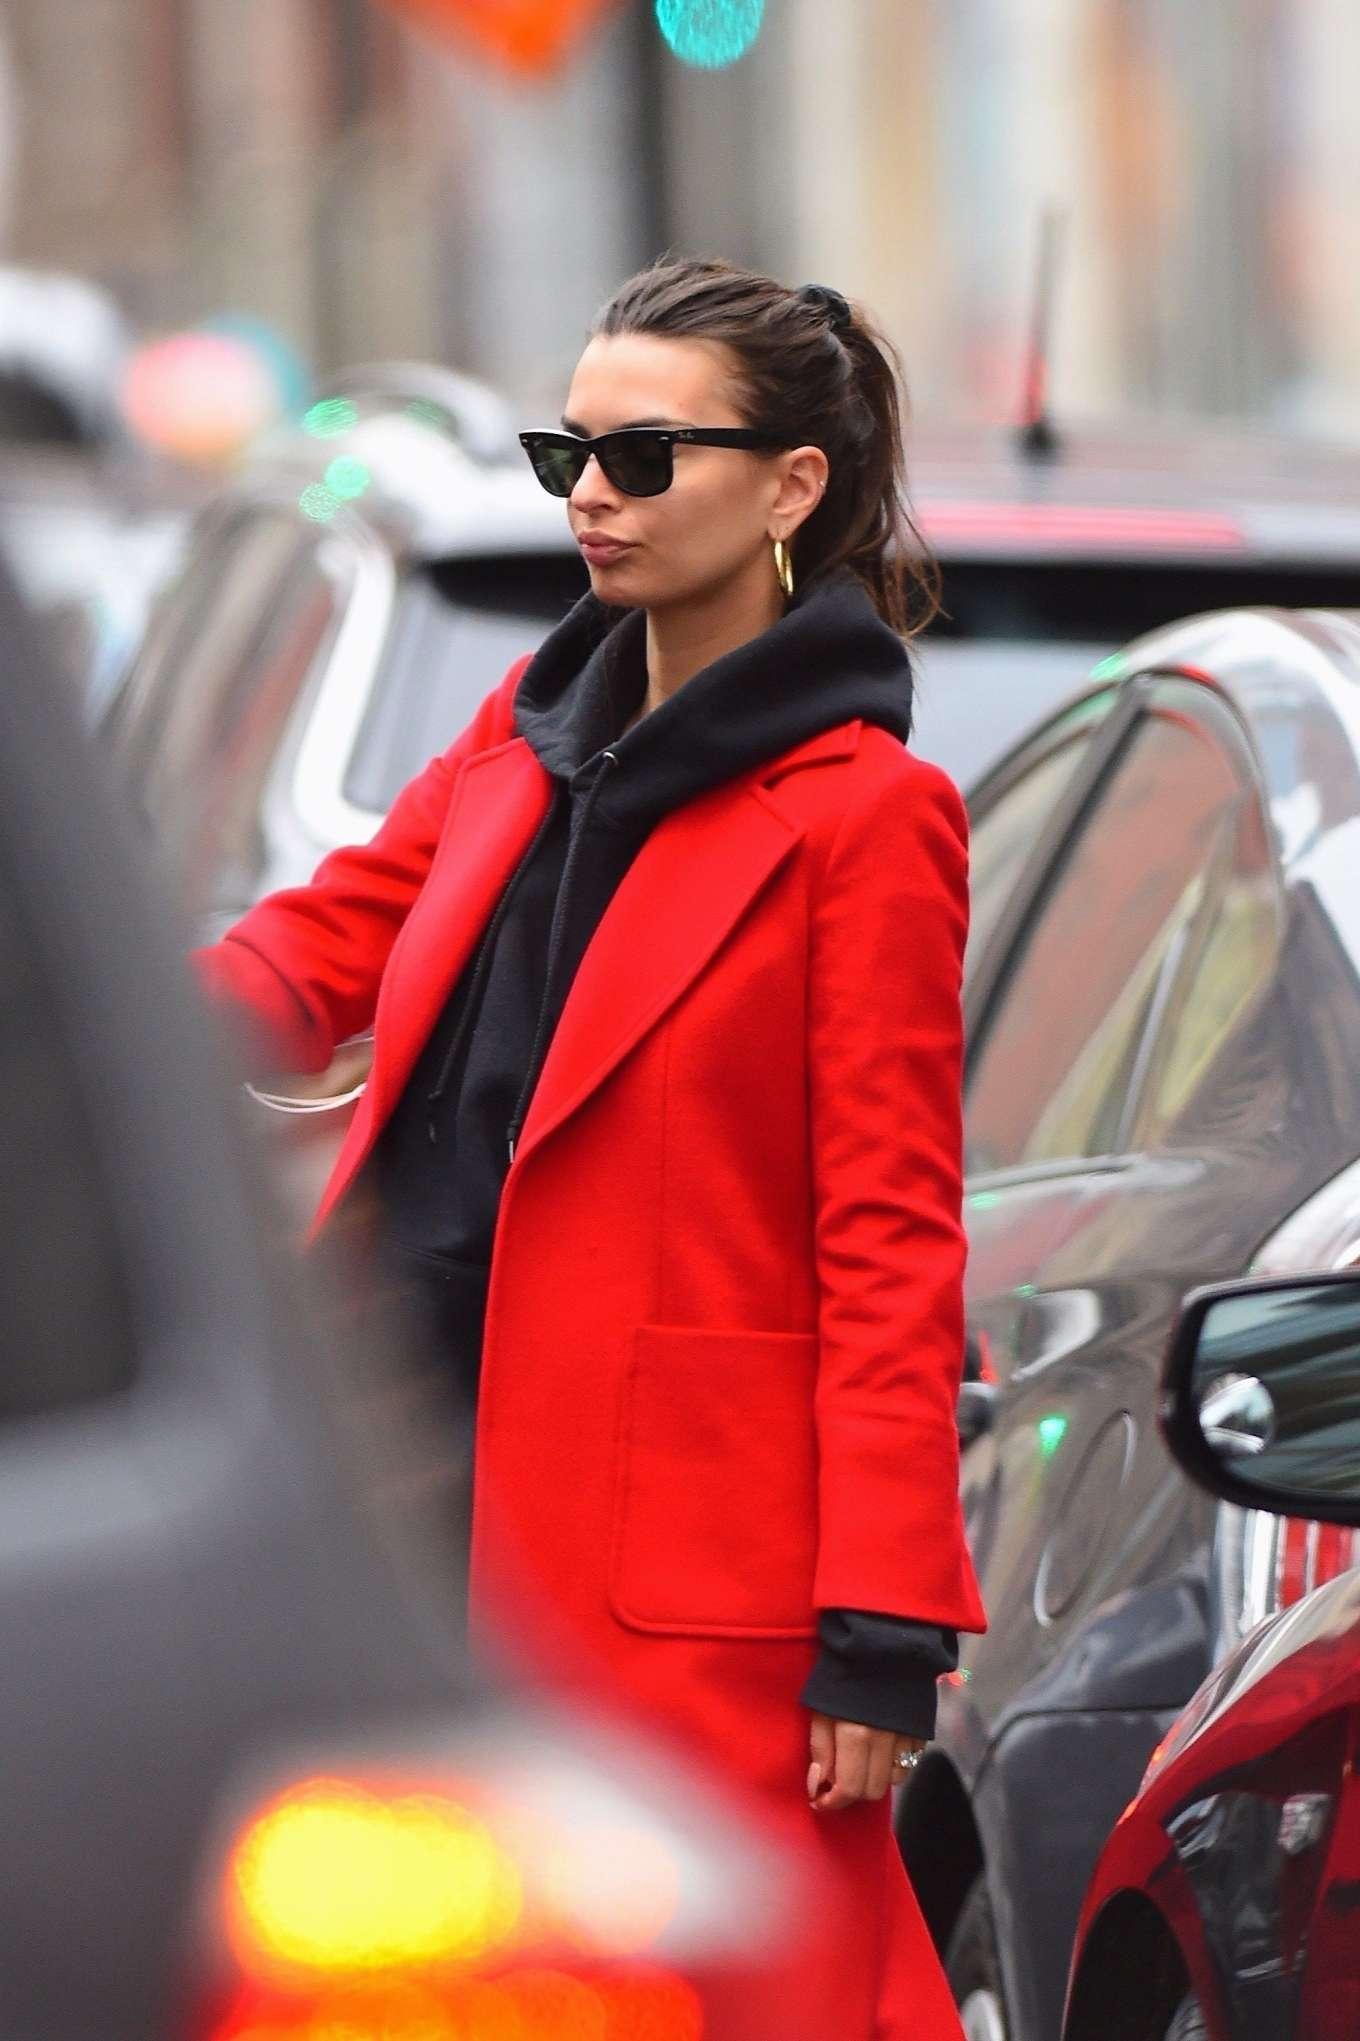 Emily Ratajkowski 2020 : Emily Ratajkowski in red coat ready for flight at JFK airport-18